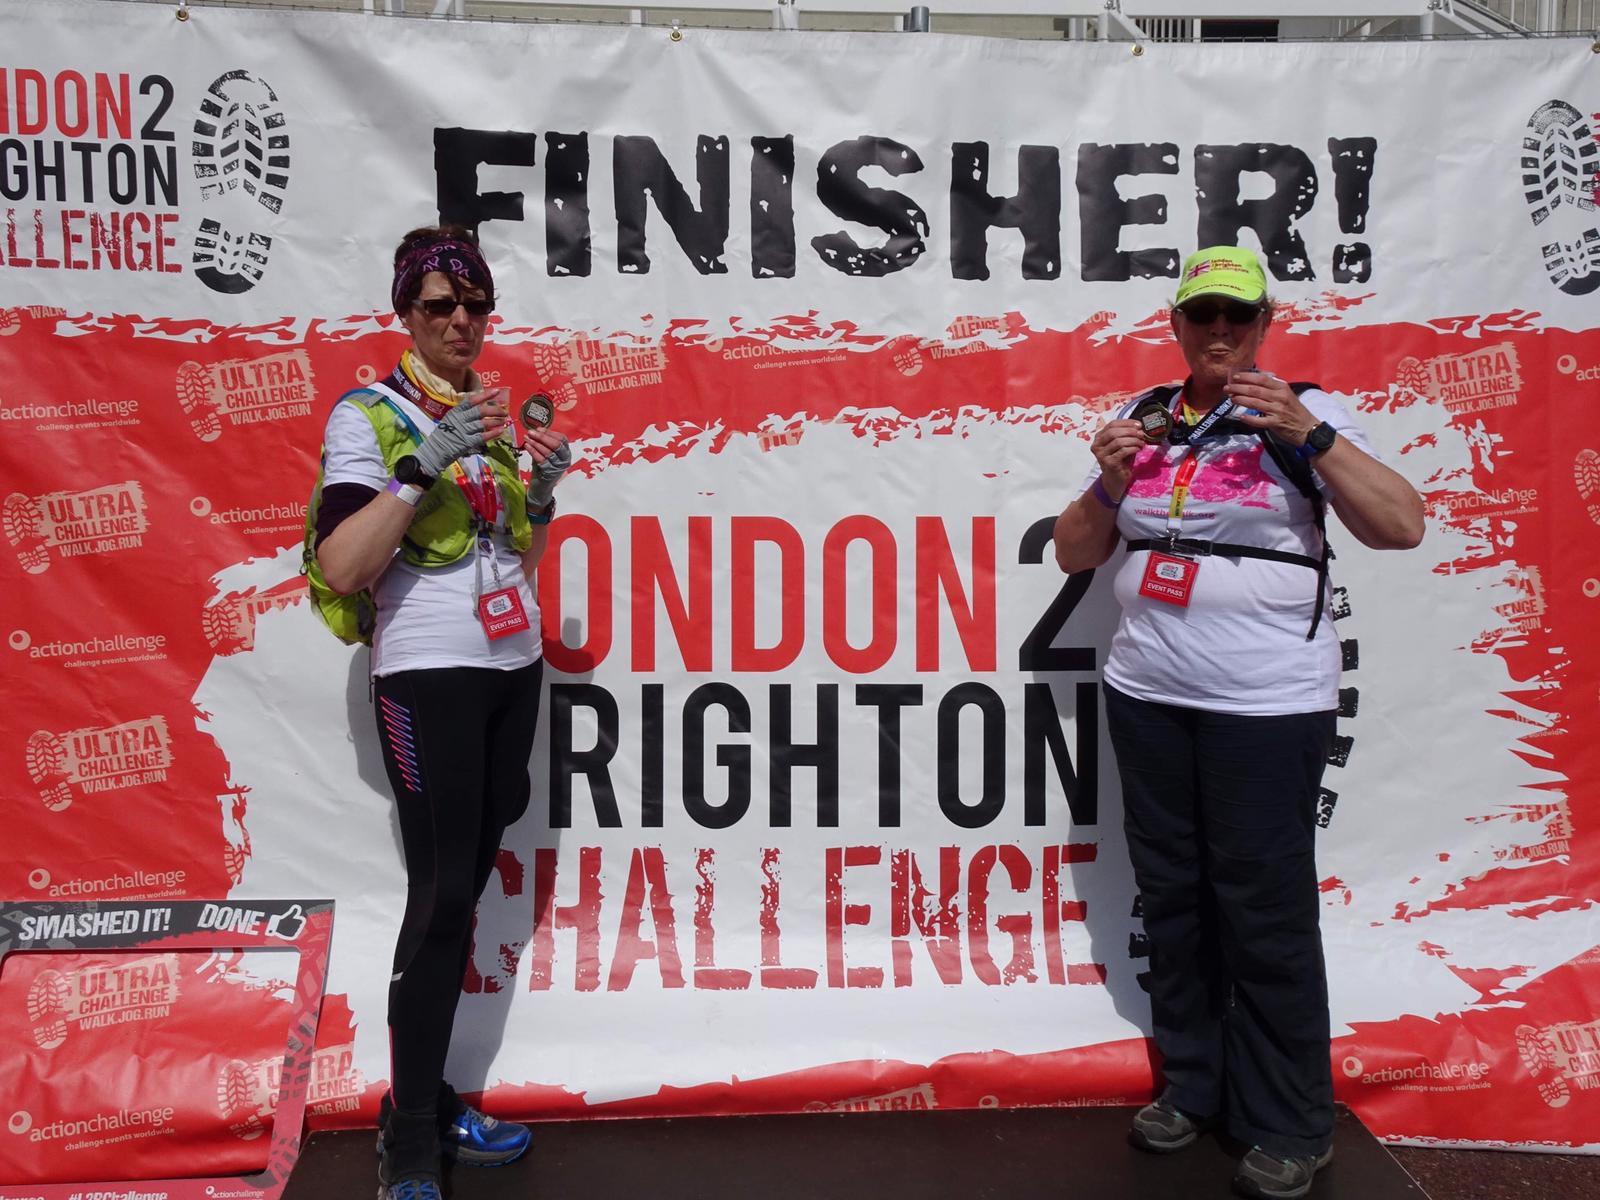 London to Brighton finish - Julie and Jane